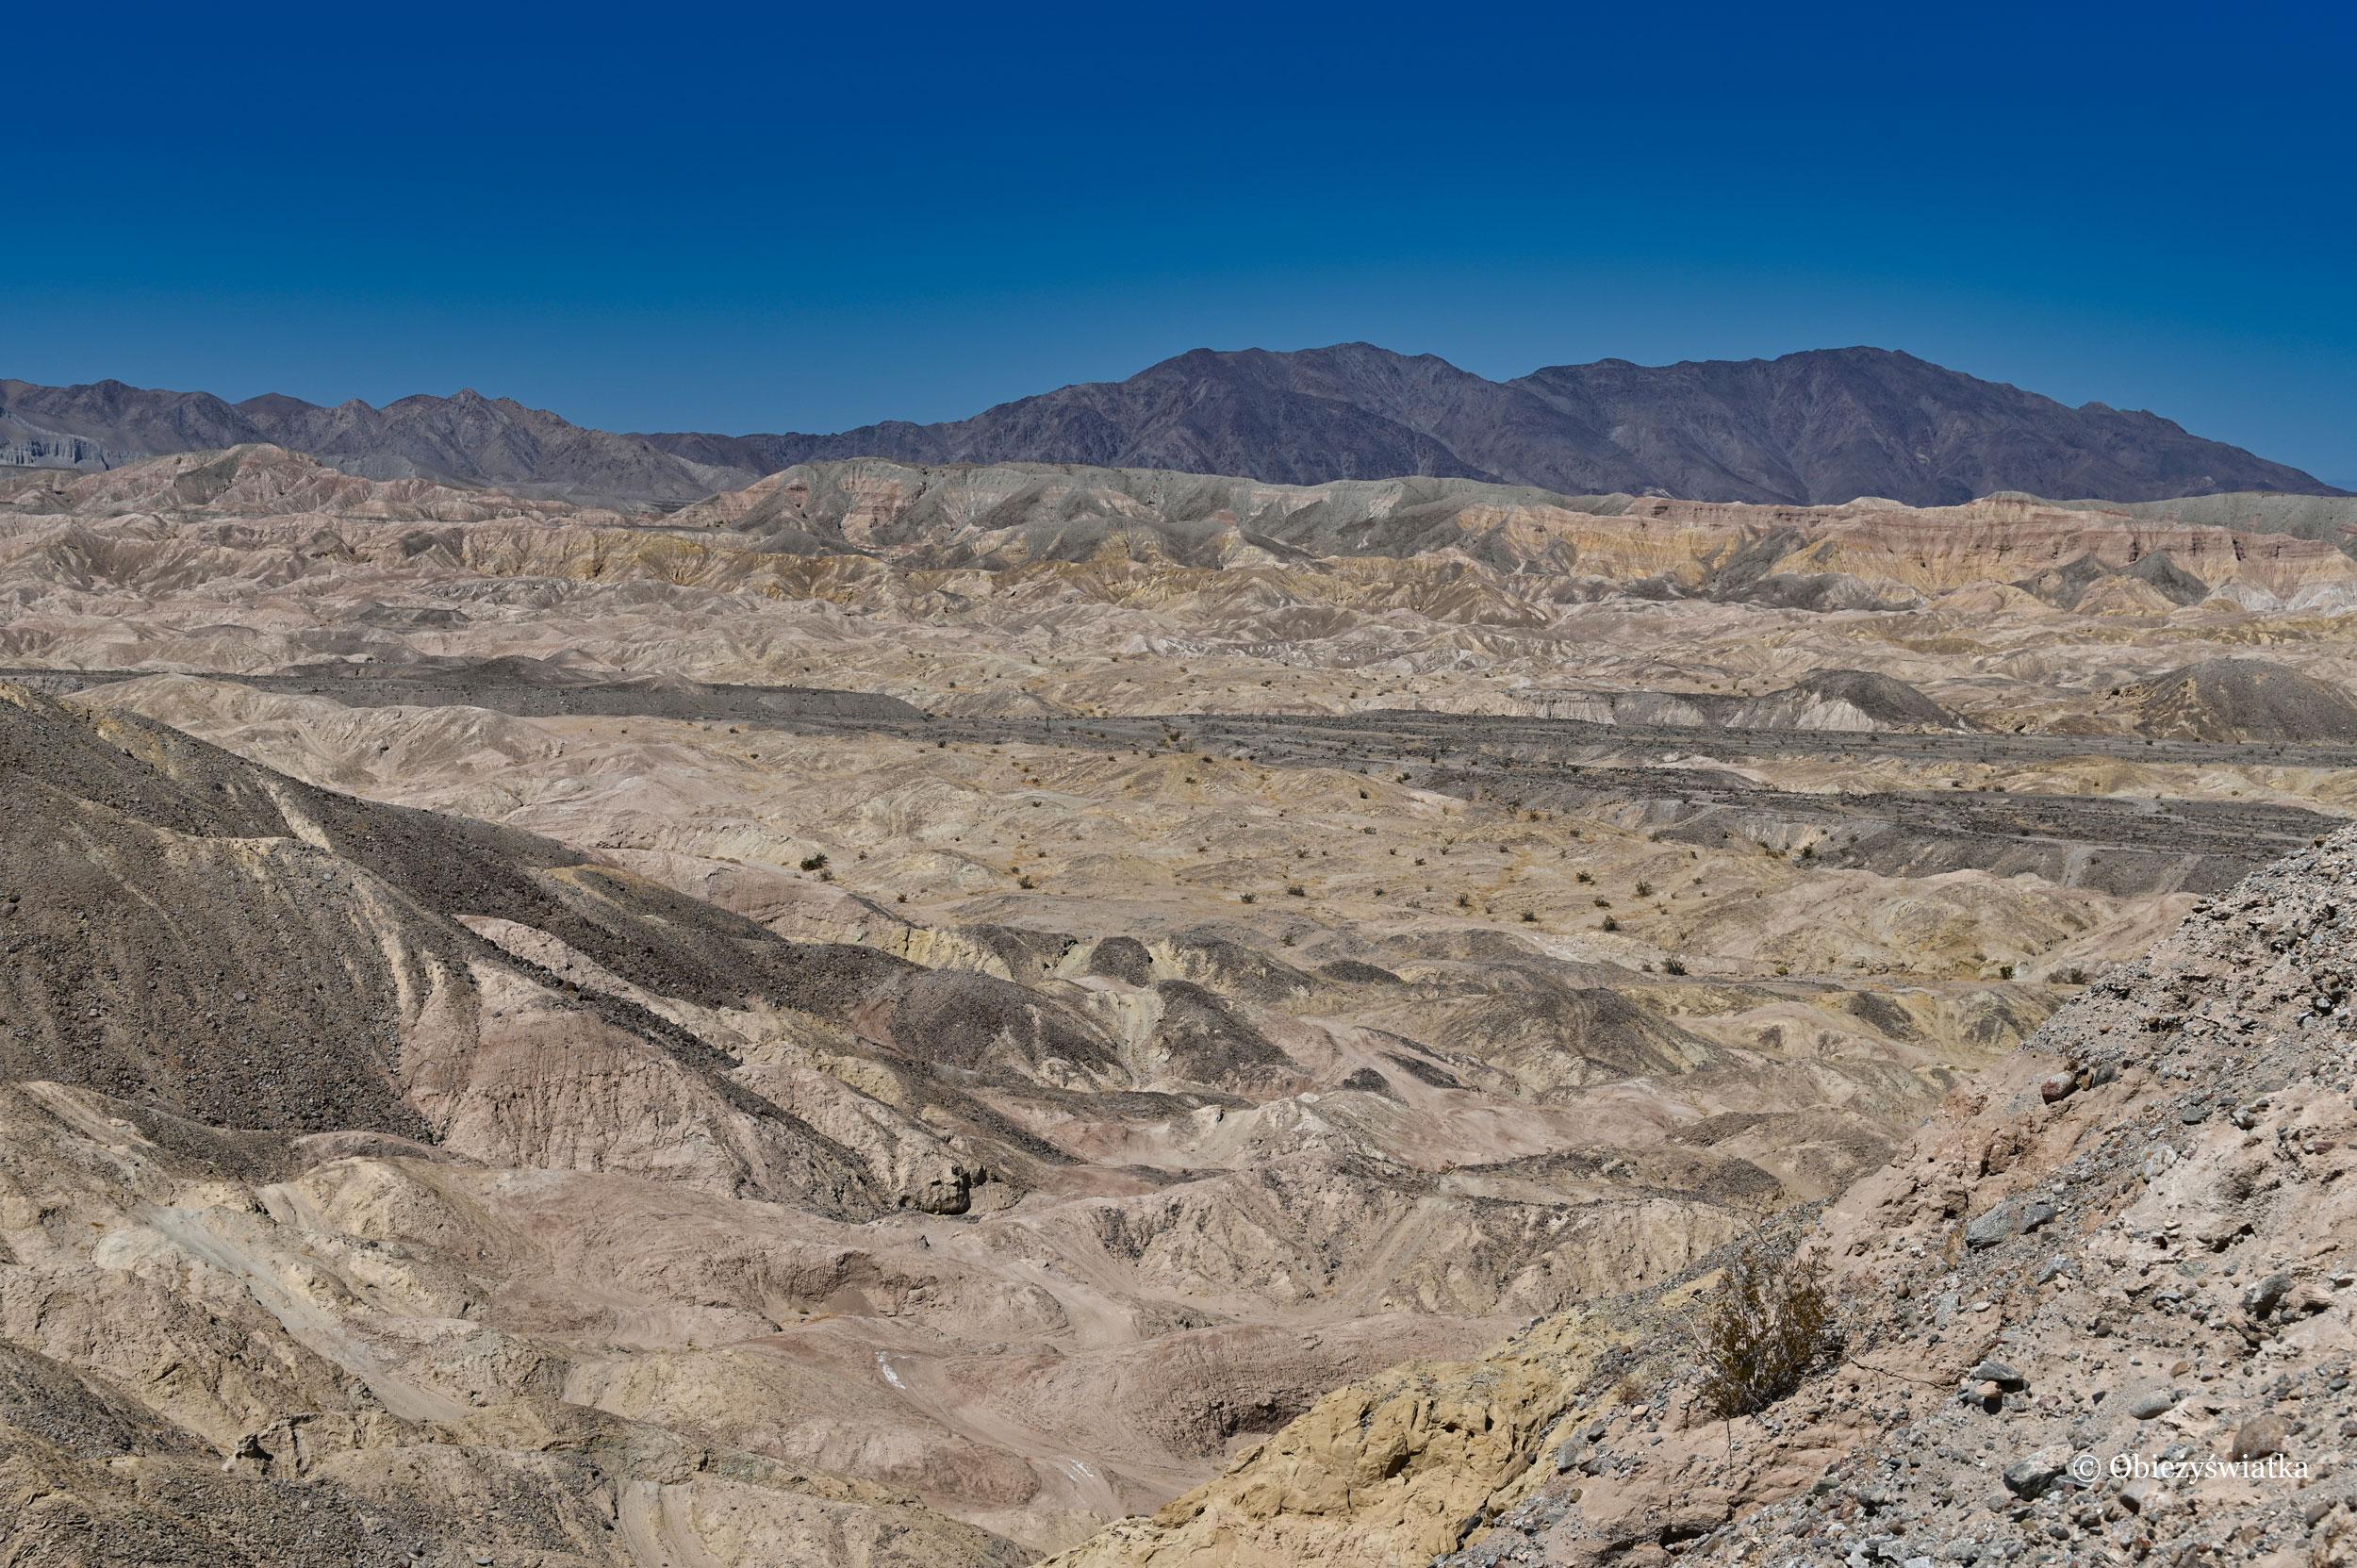 Piękny krajobraz Anza Borrego Desert State Park, Kalifornia